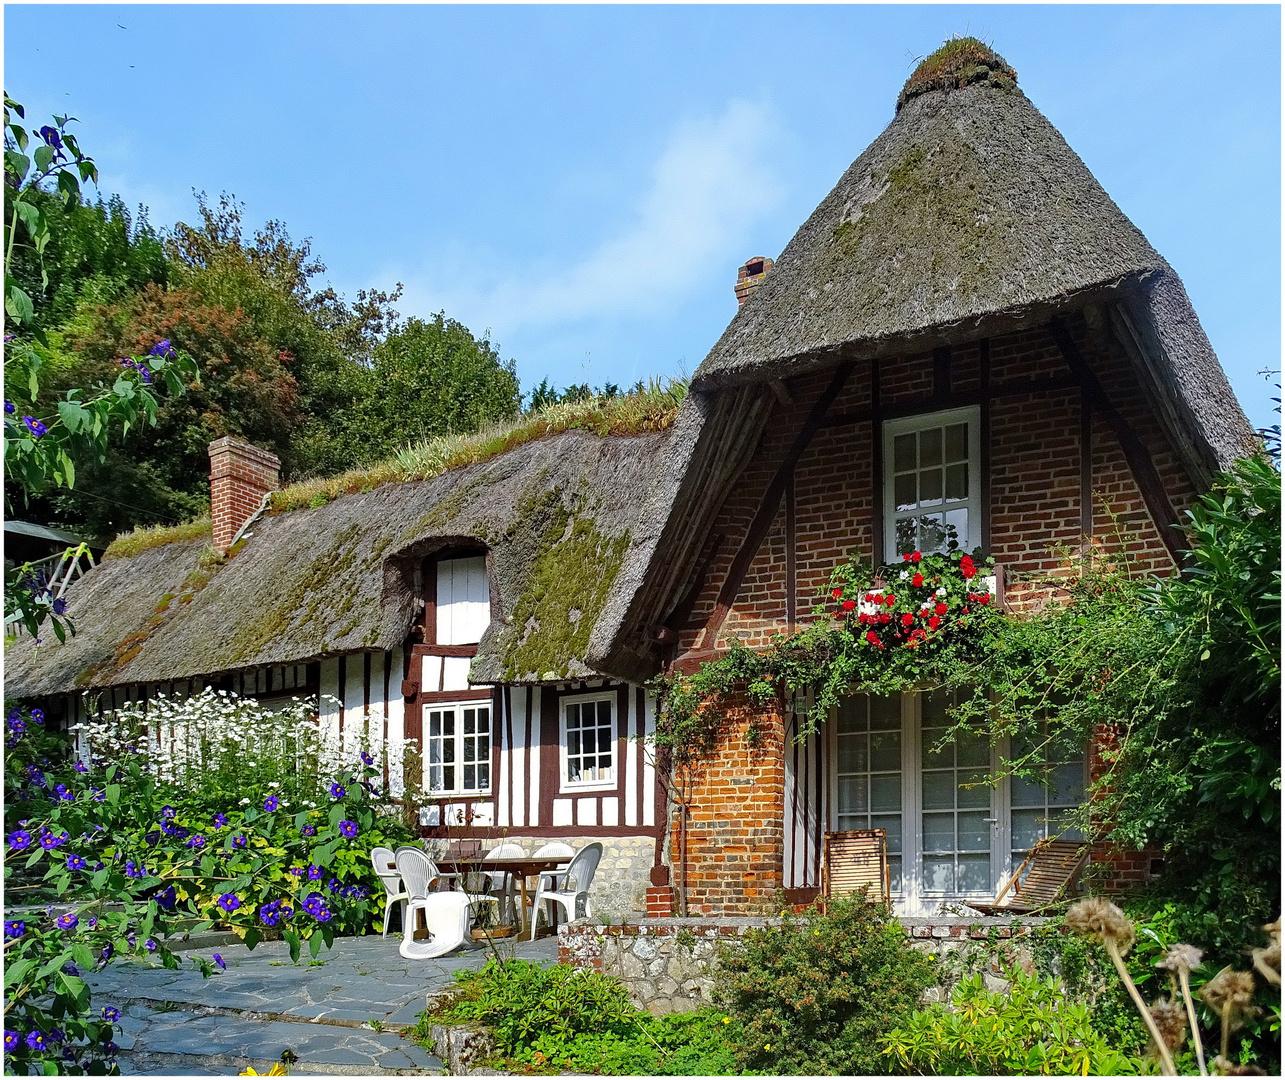 Haus Bild: Traditionelles Haus In Der Haute-Normandie Foto & Bild